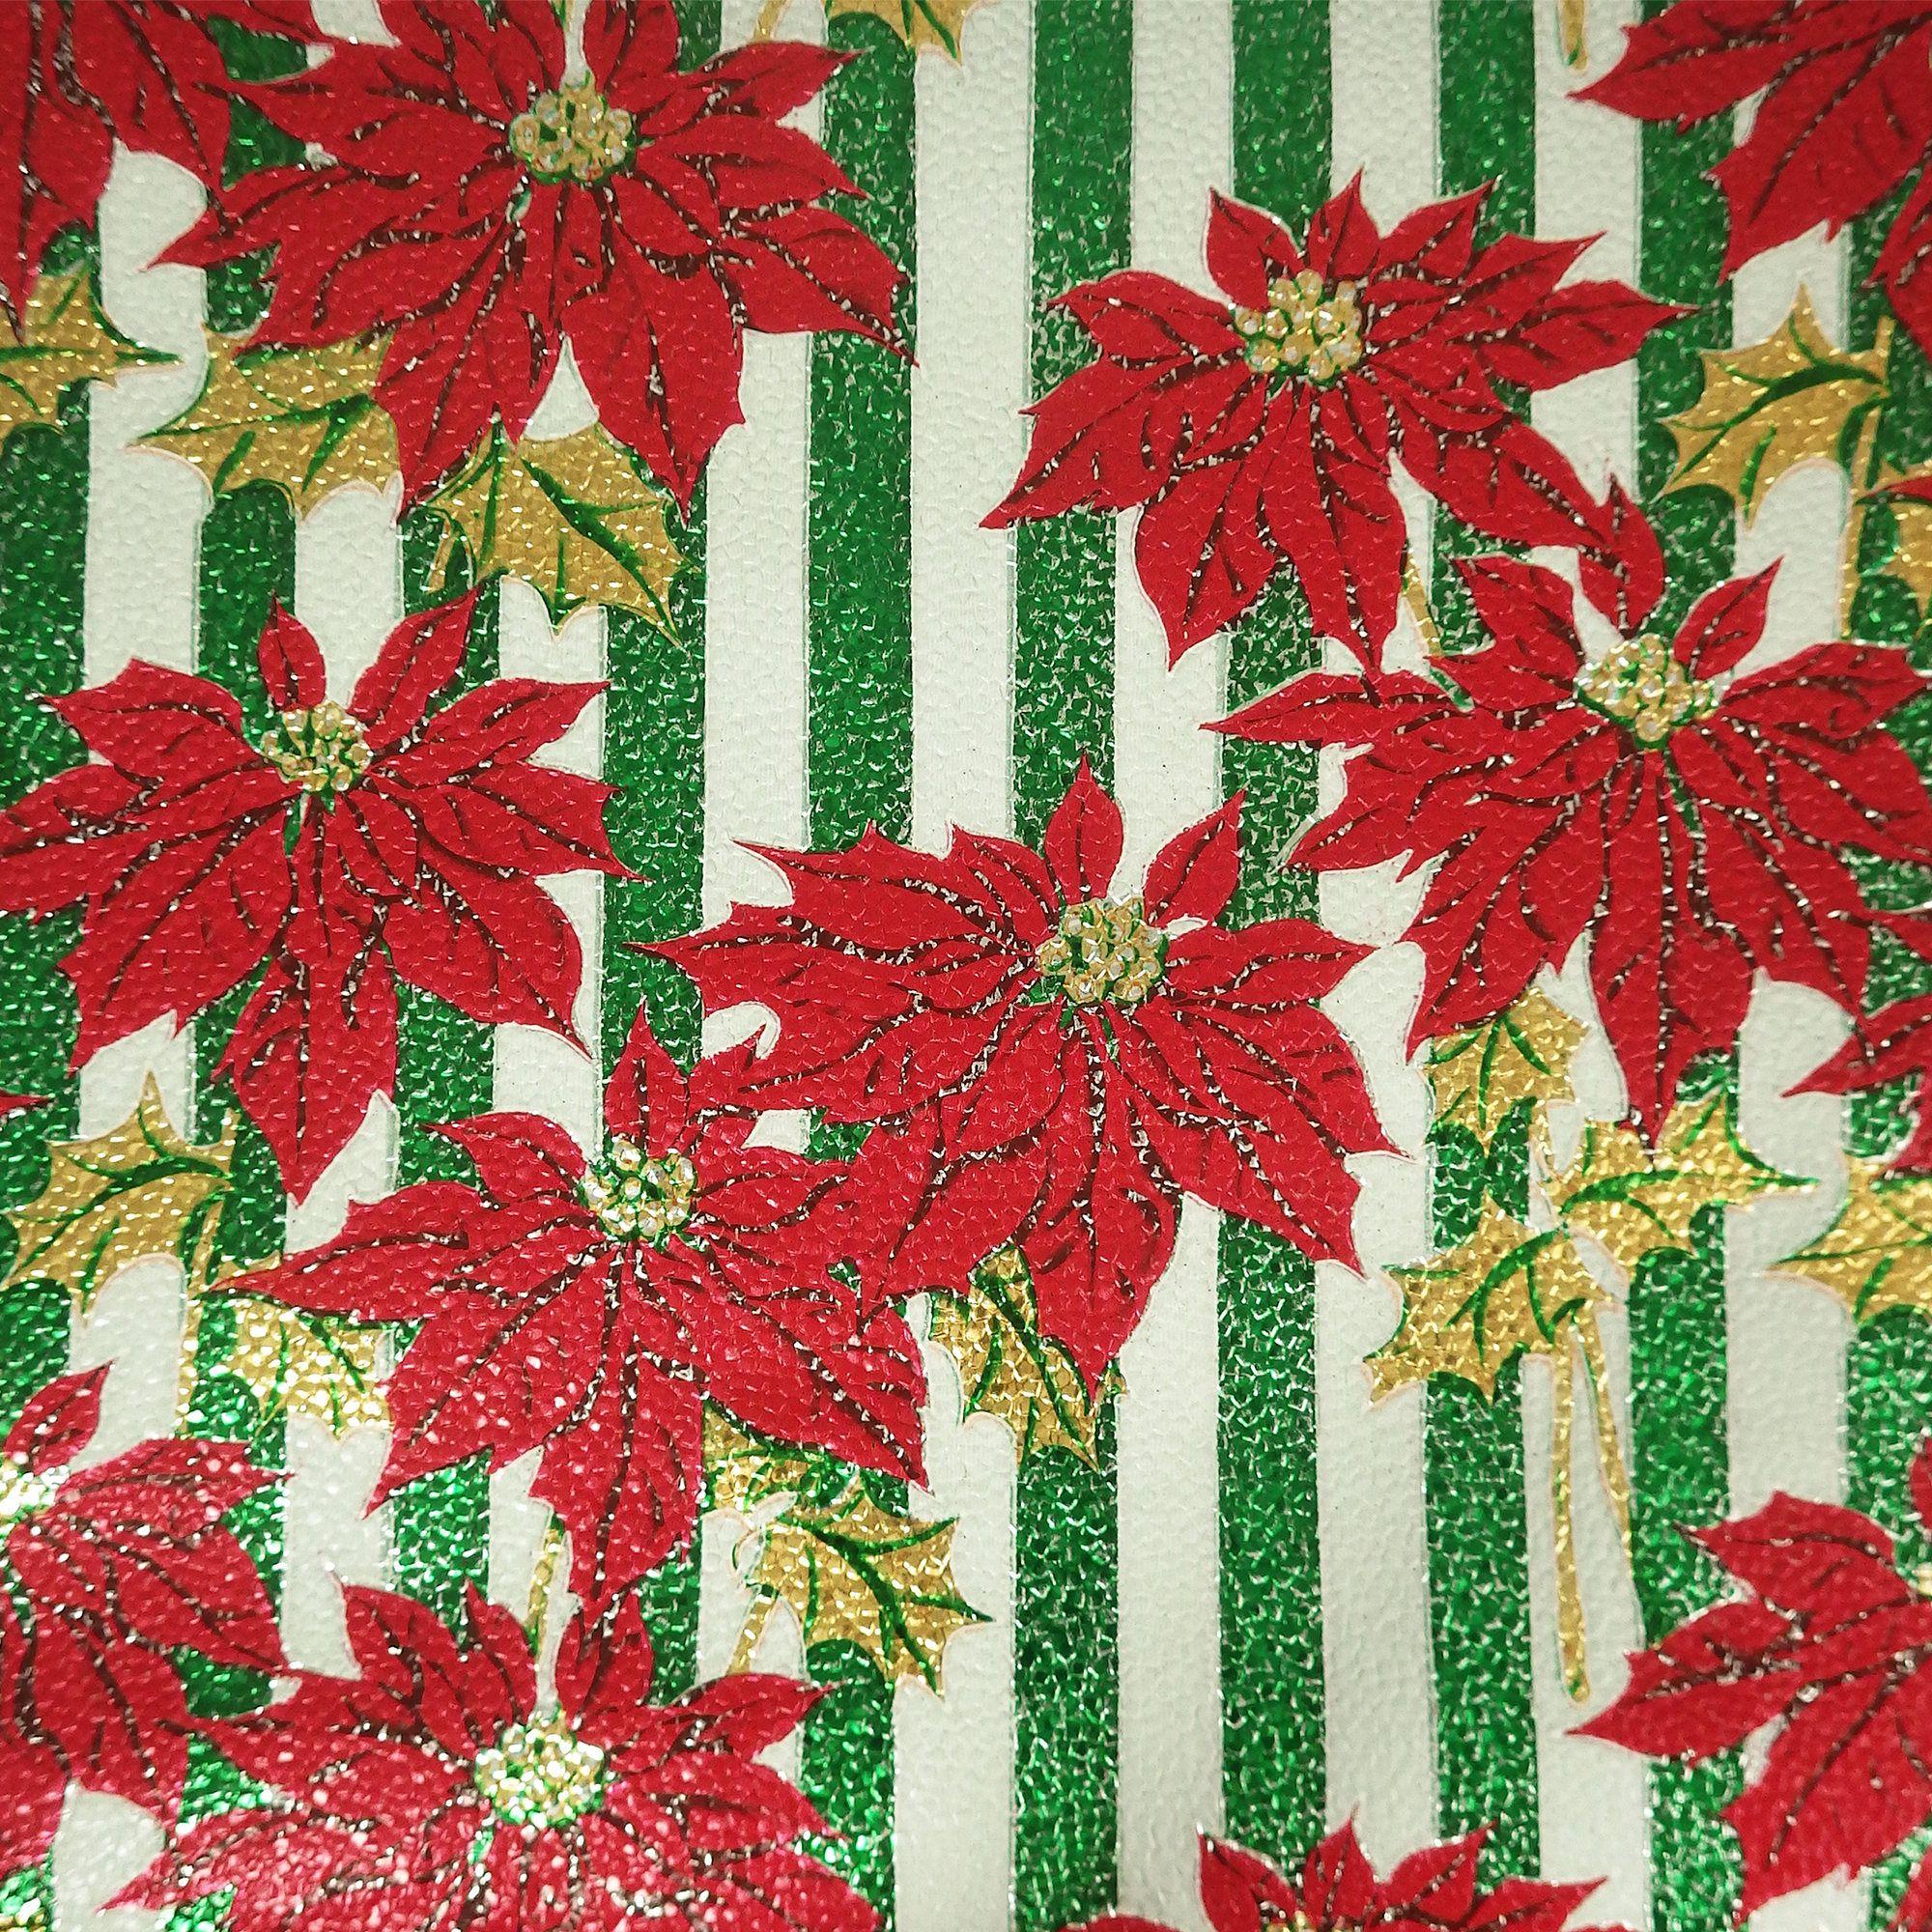 Poinsettia Flower Vintage Christmas Wrapping Paper Roll Foil Etsy Vintage Christmas Wrapping Paper Christmas Wrapping Paper Vintage Wrapping Paper